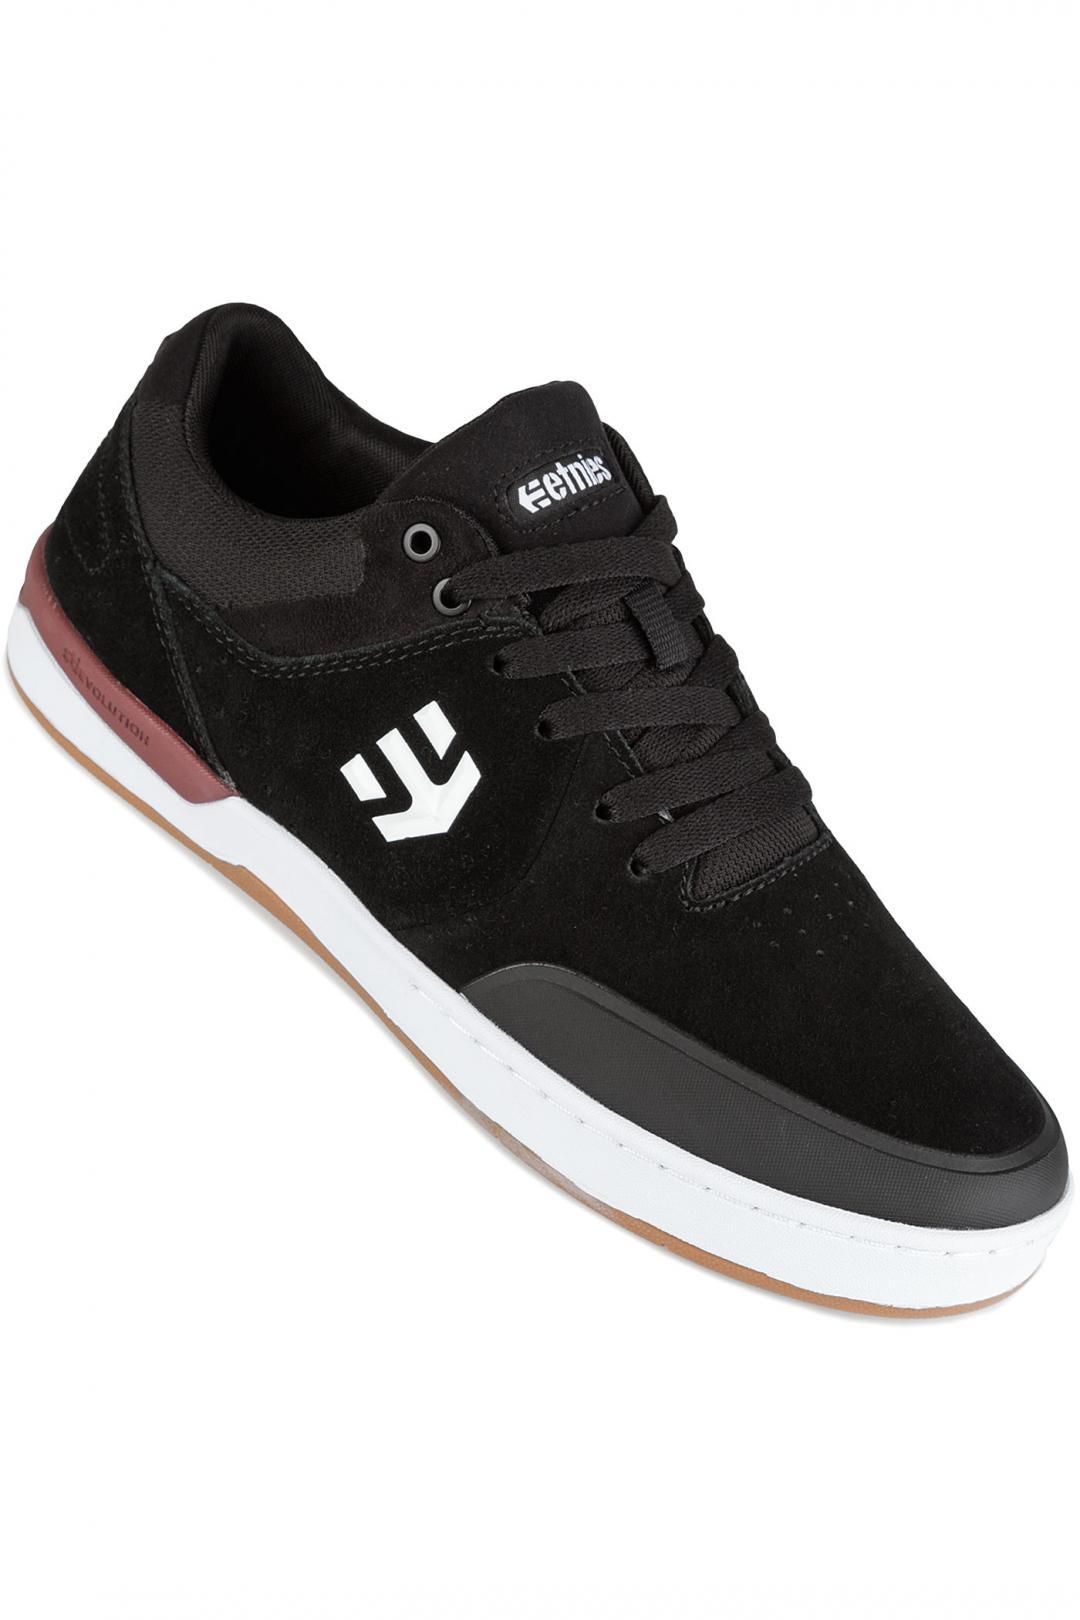 Uomo Etnies Marana XT black white burgundy | Sneakers low top